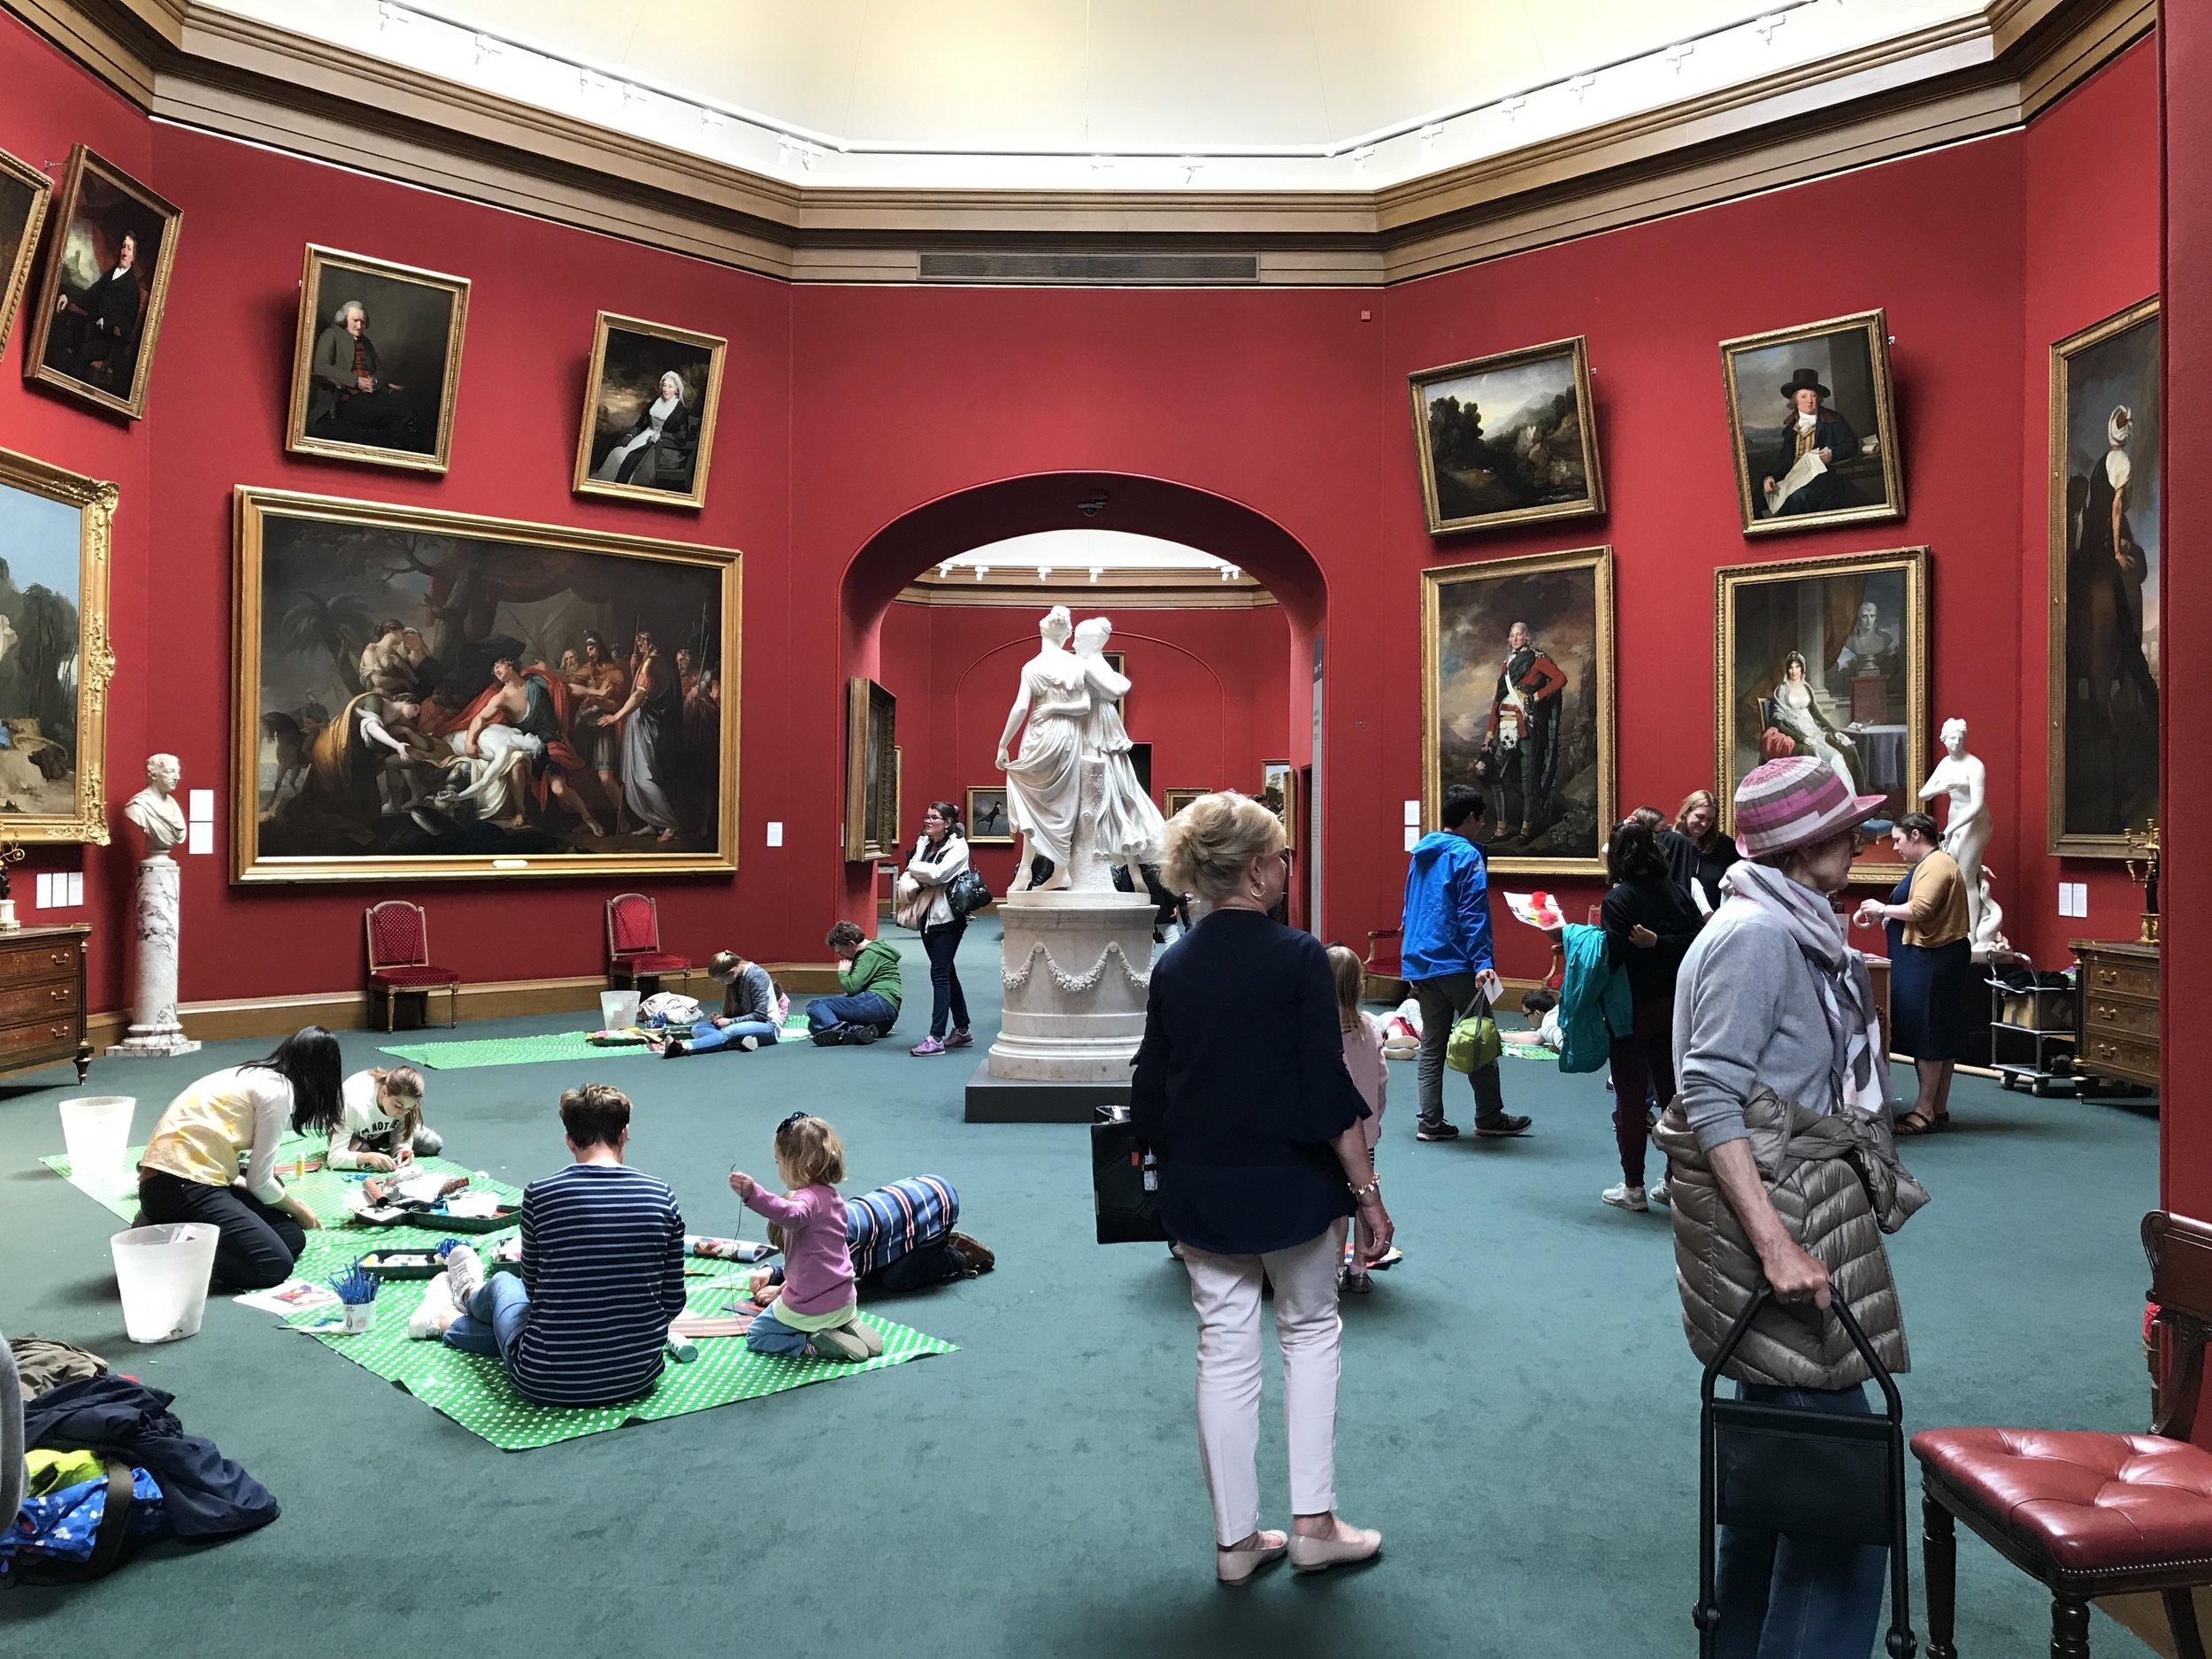 Scottish National Gallery, Edinburgh, Schotland, De Museumpodcast